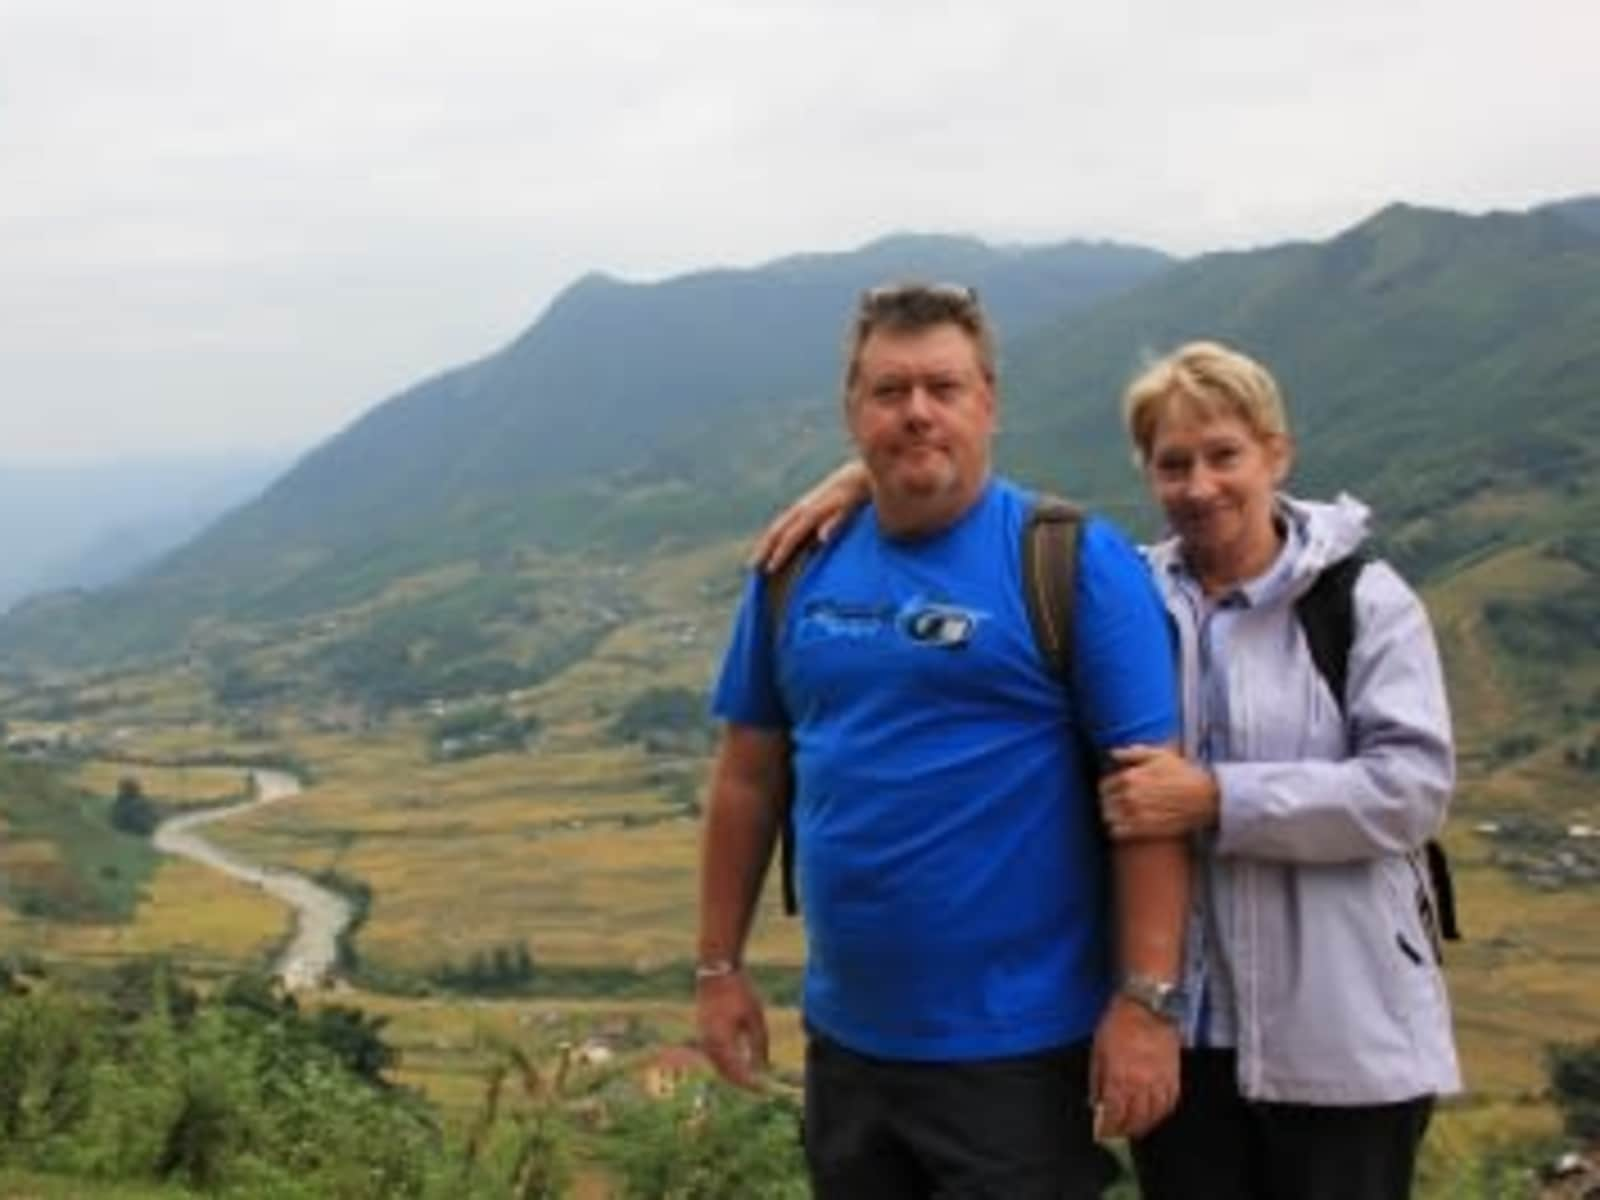 Chris & Linda from Newcastle upon Tyne, United Kingdom